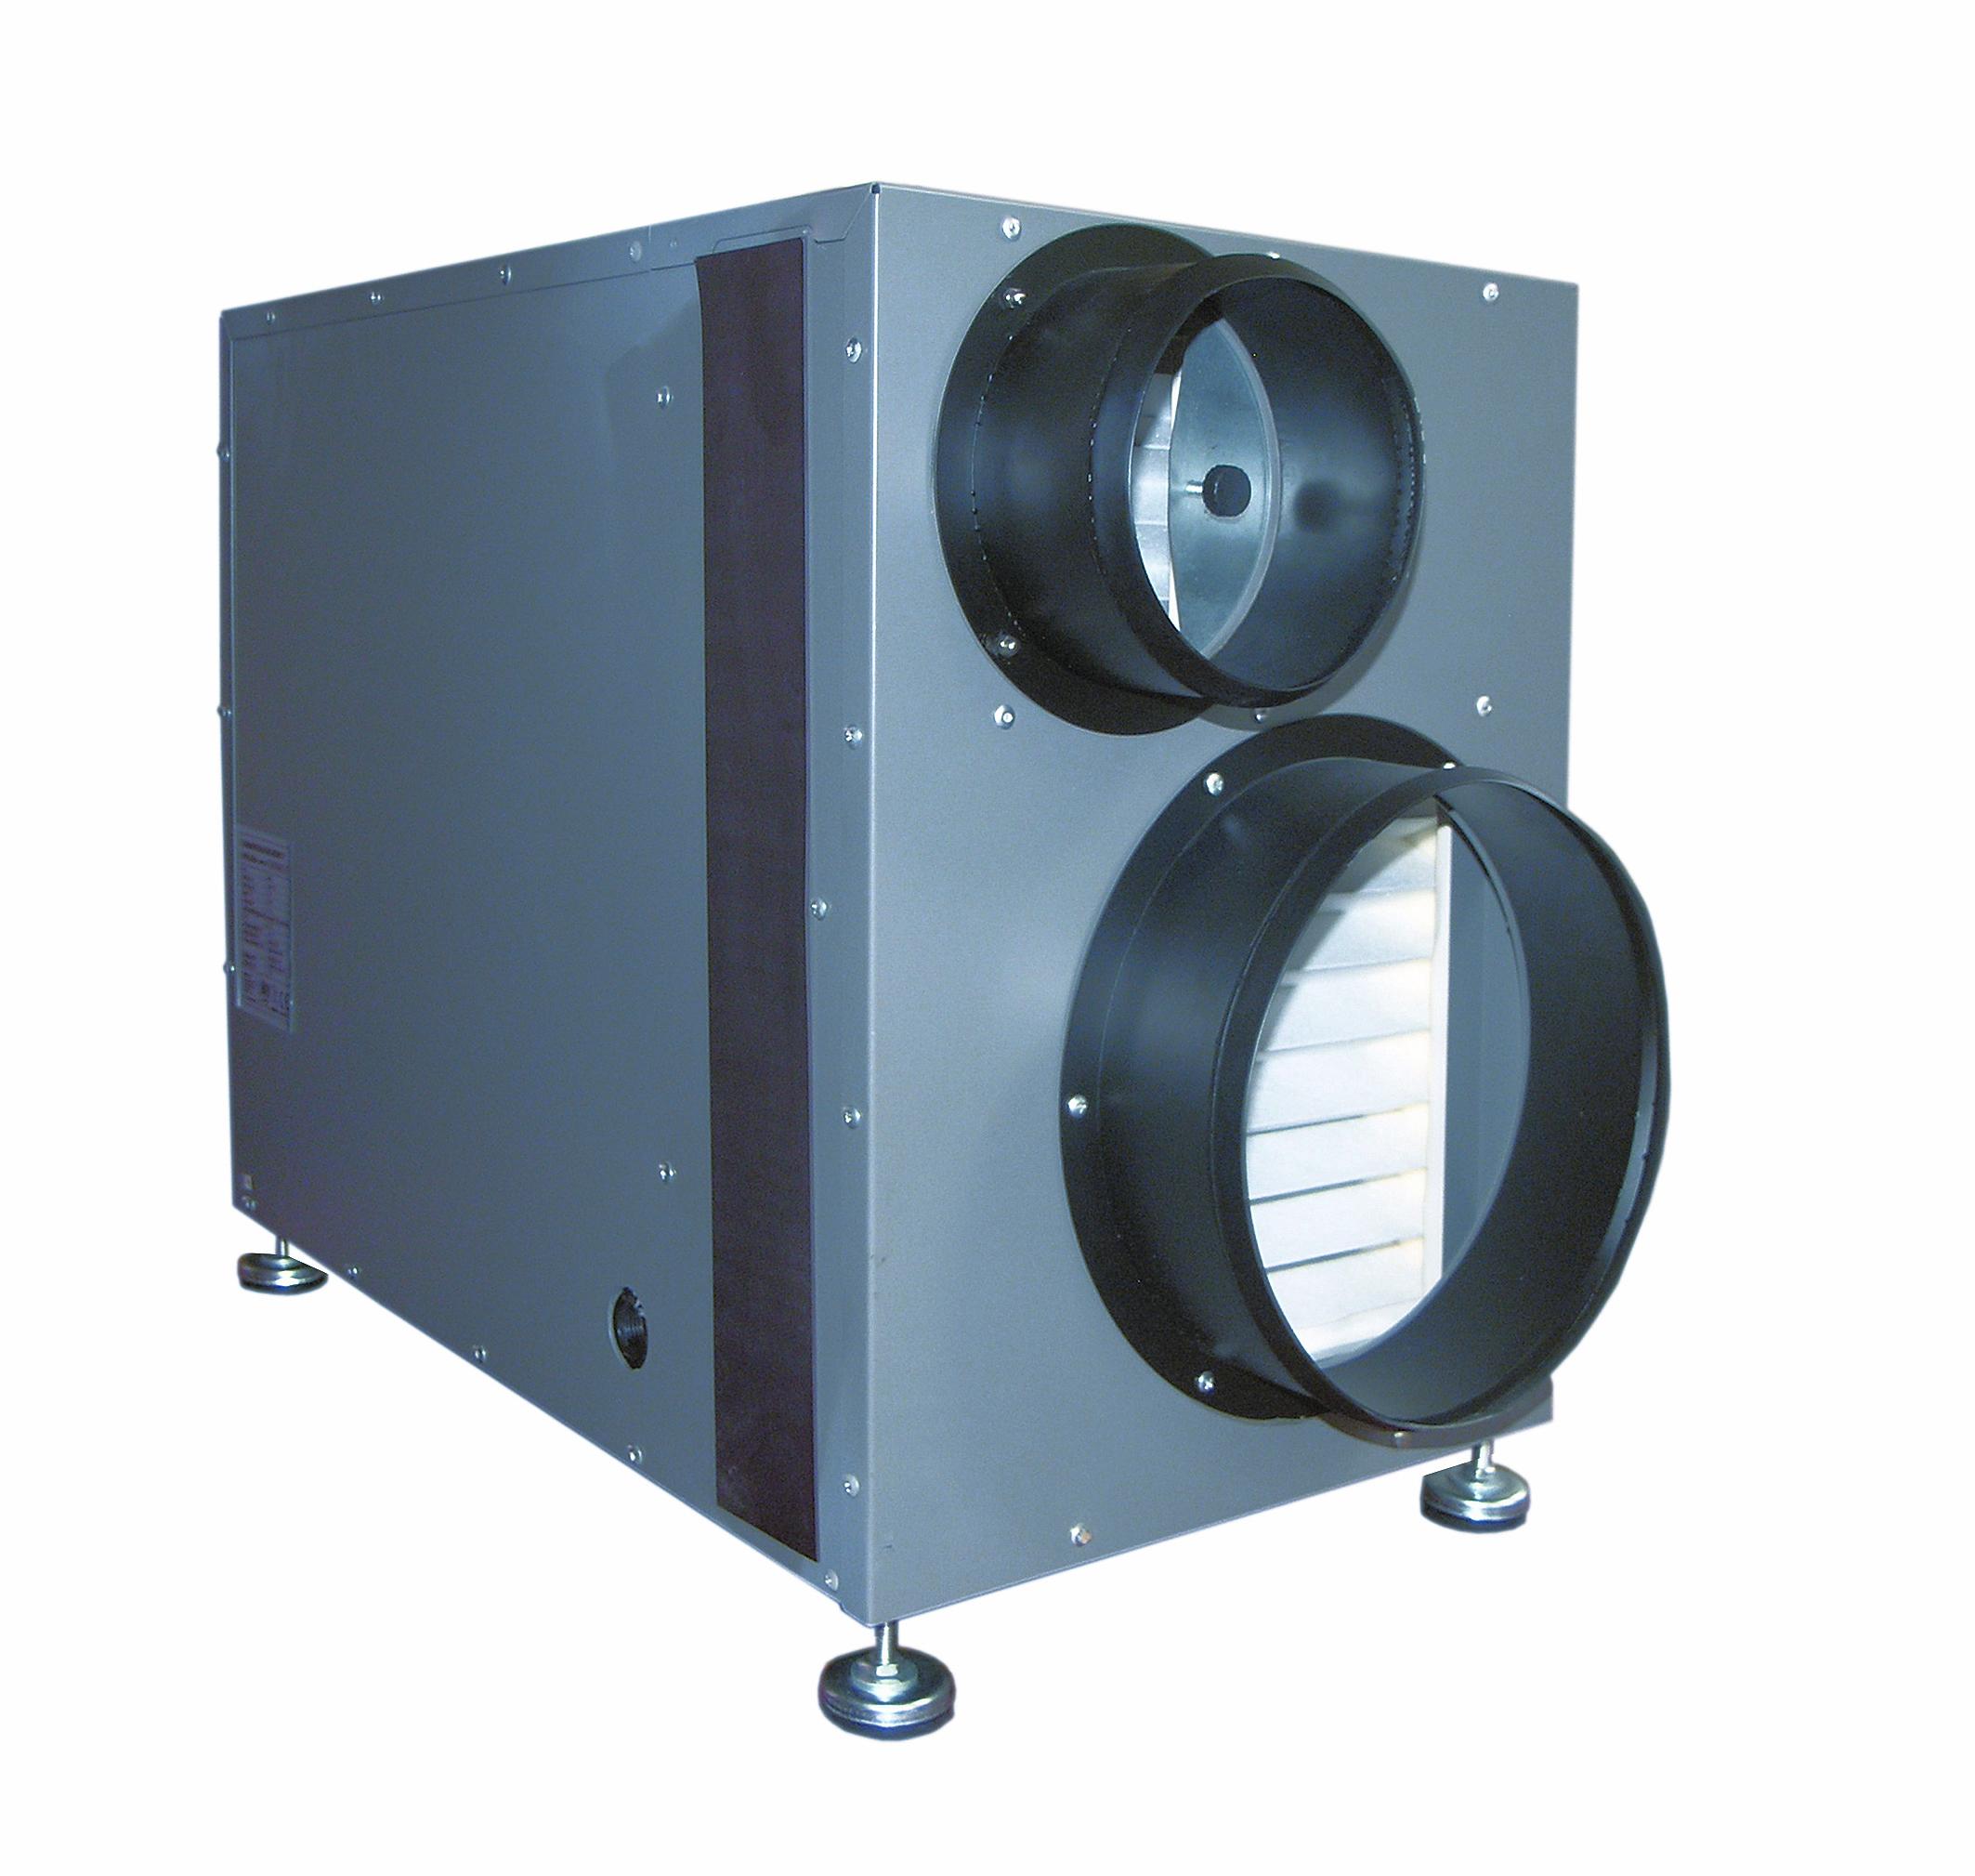 ld800 side dehumidifiers by Ecor Pro